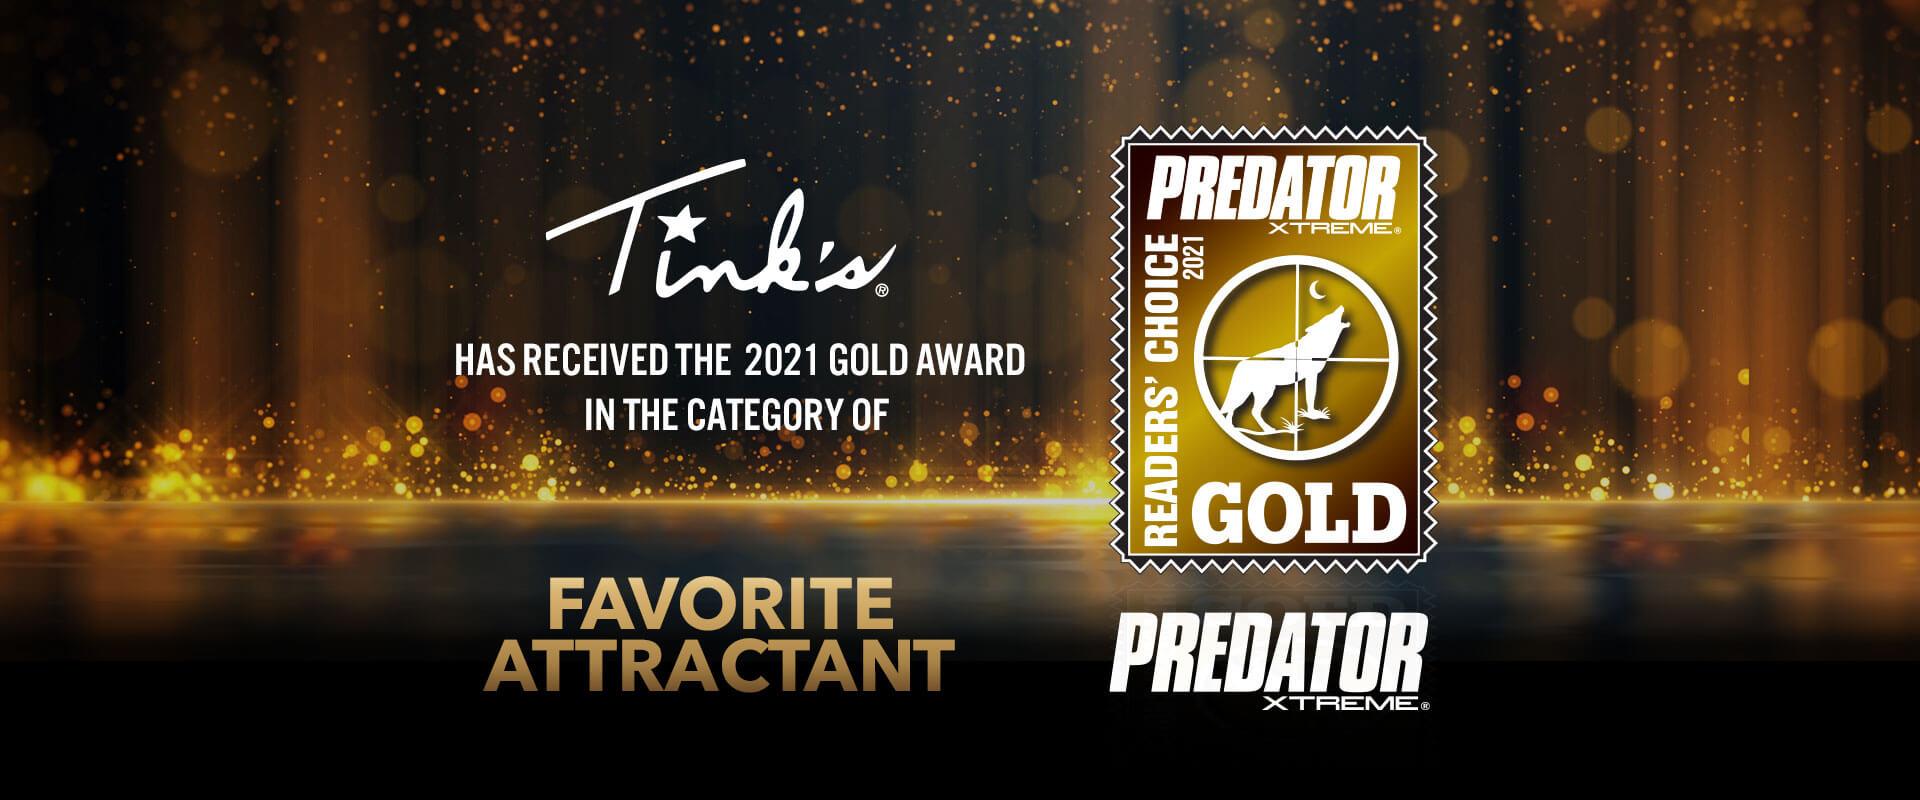 2021 Predator Xtreme Gold Award